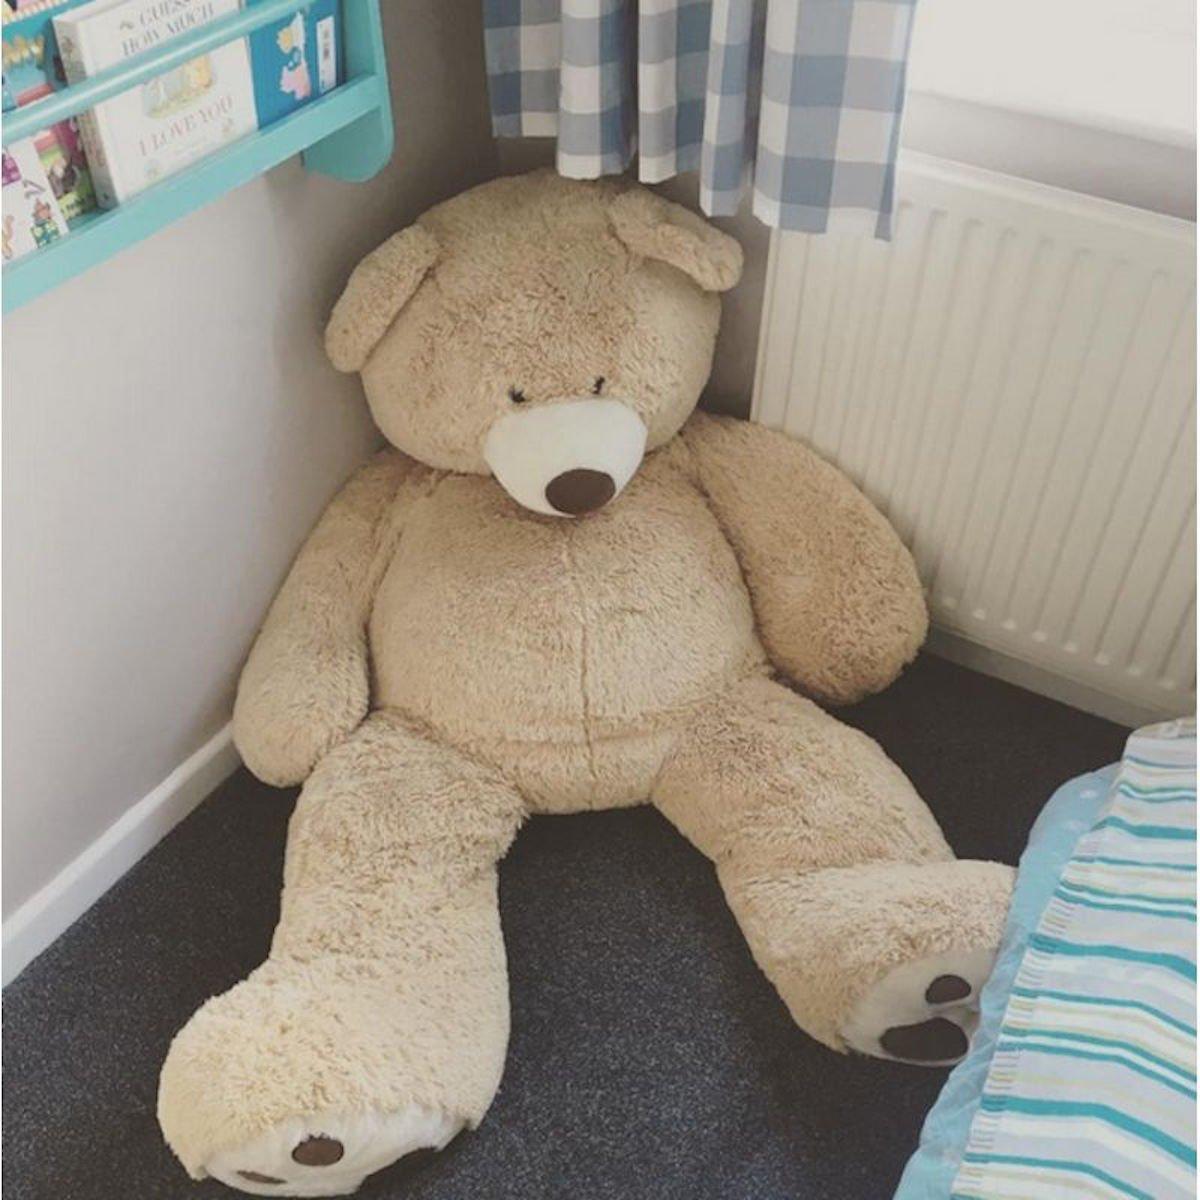 Hay Hay Chicken Stuffed Animal, Big Teddy Bear Soft Plush Toys Large C Buy Online In Aruba At Desertcart